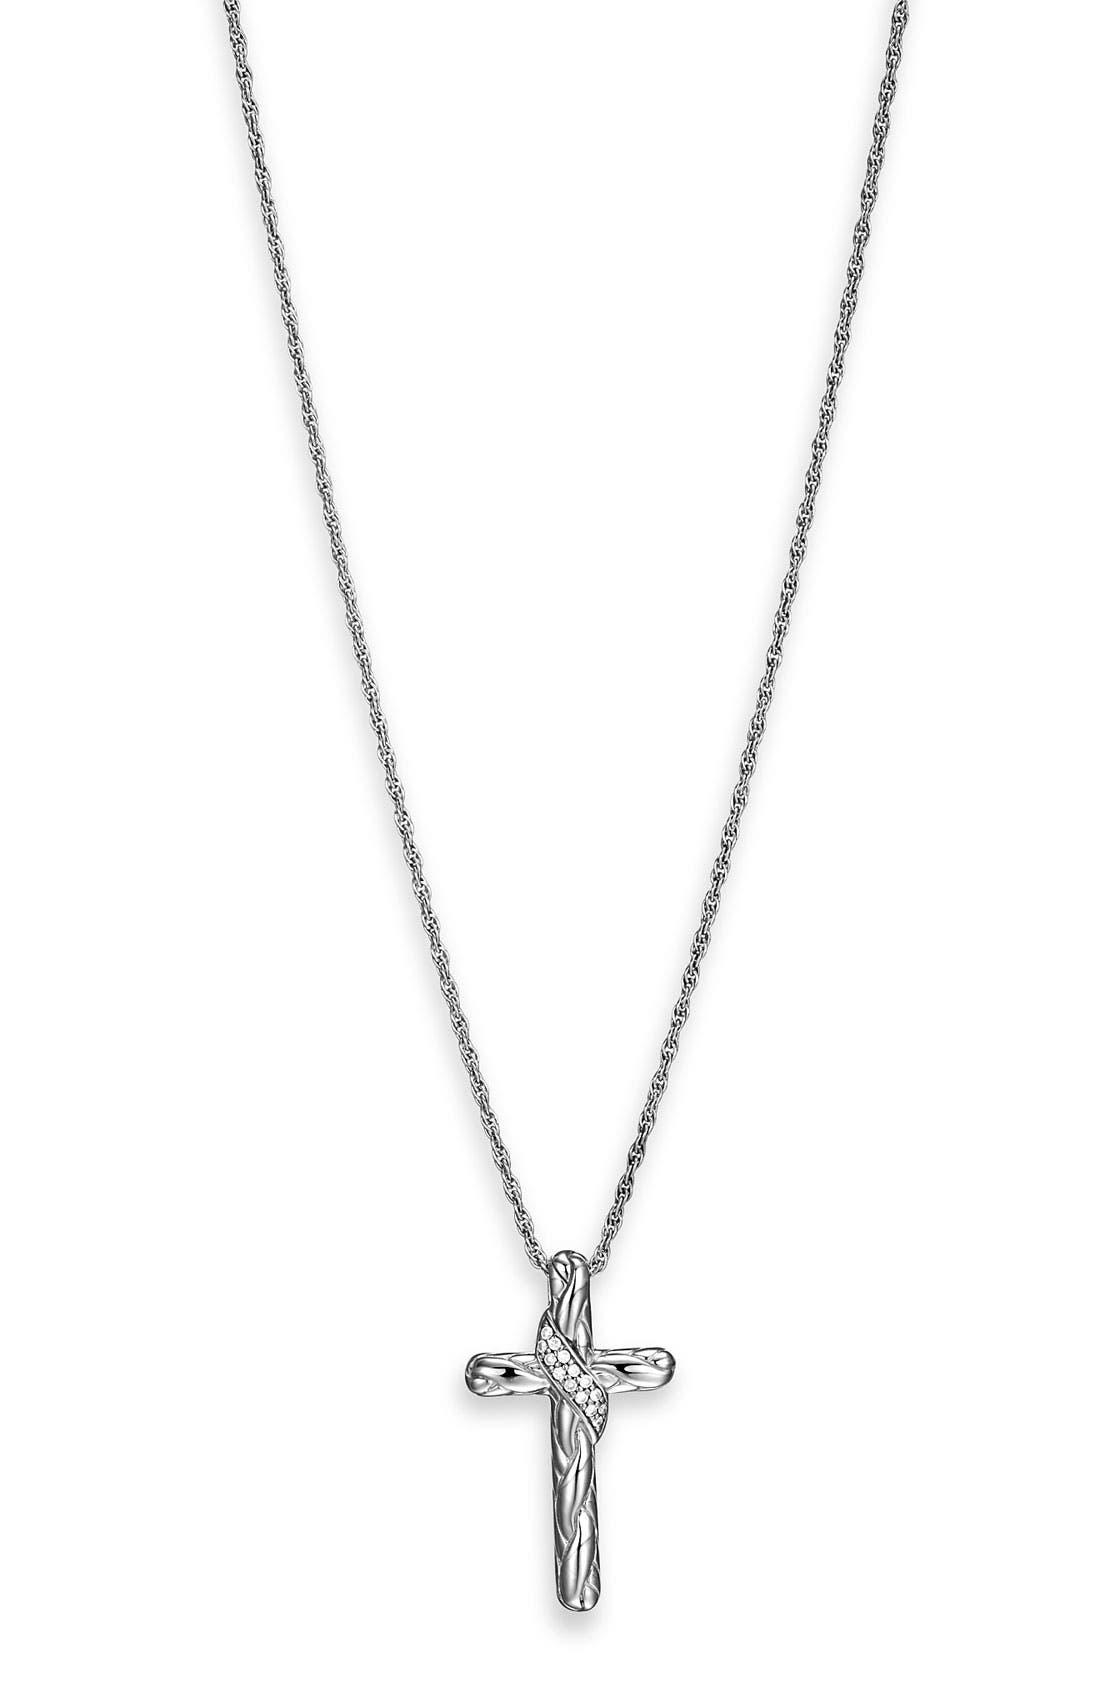 Main Image - John Hardy 'Classic Chain Kepang' Small Diamond Cross Pendant Necklace